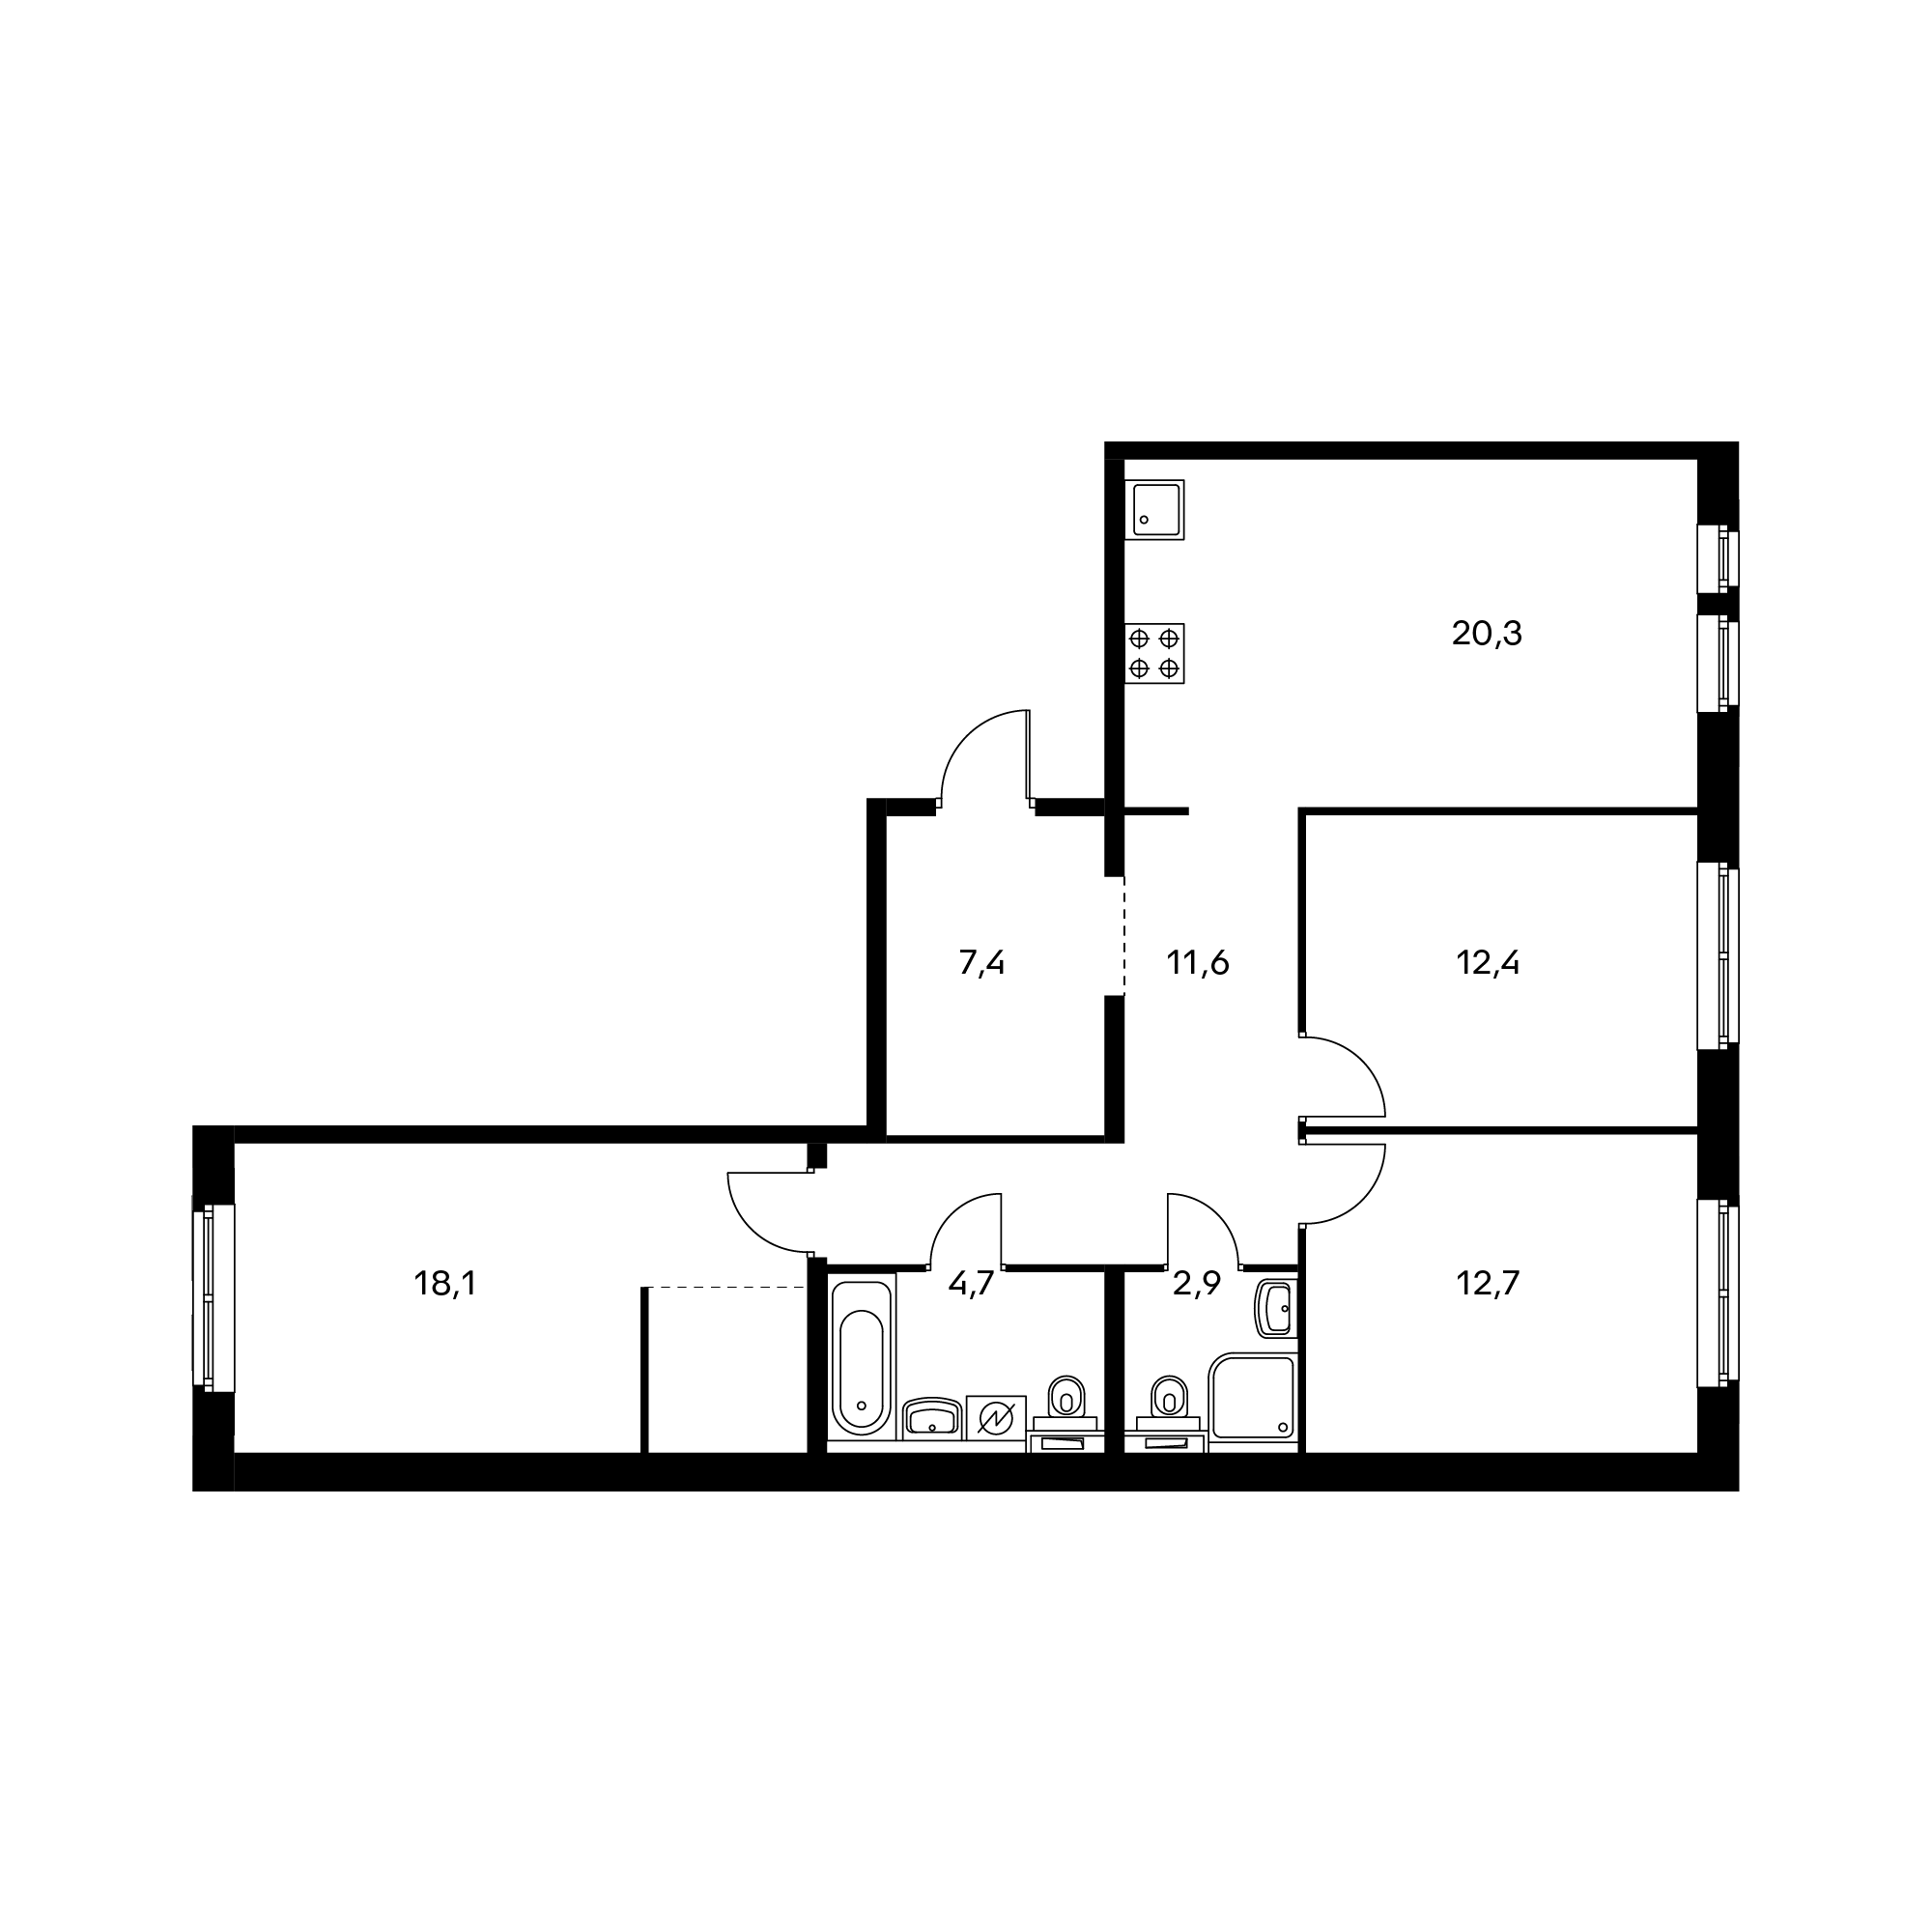 3EL3_10.2-5